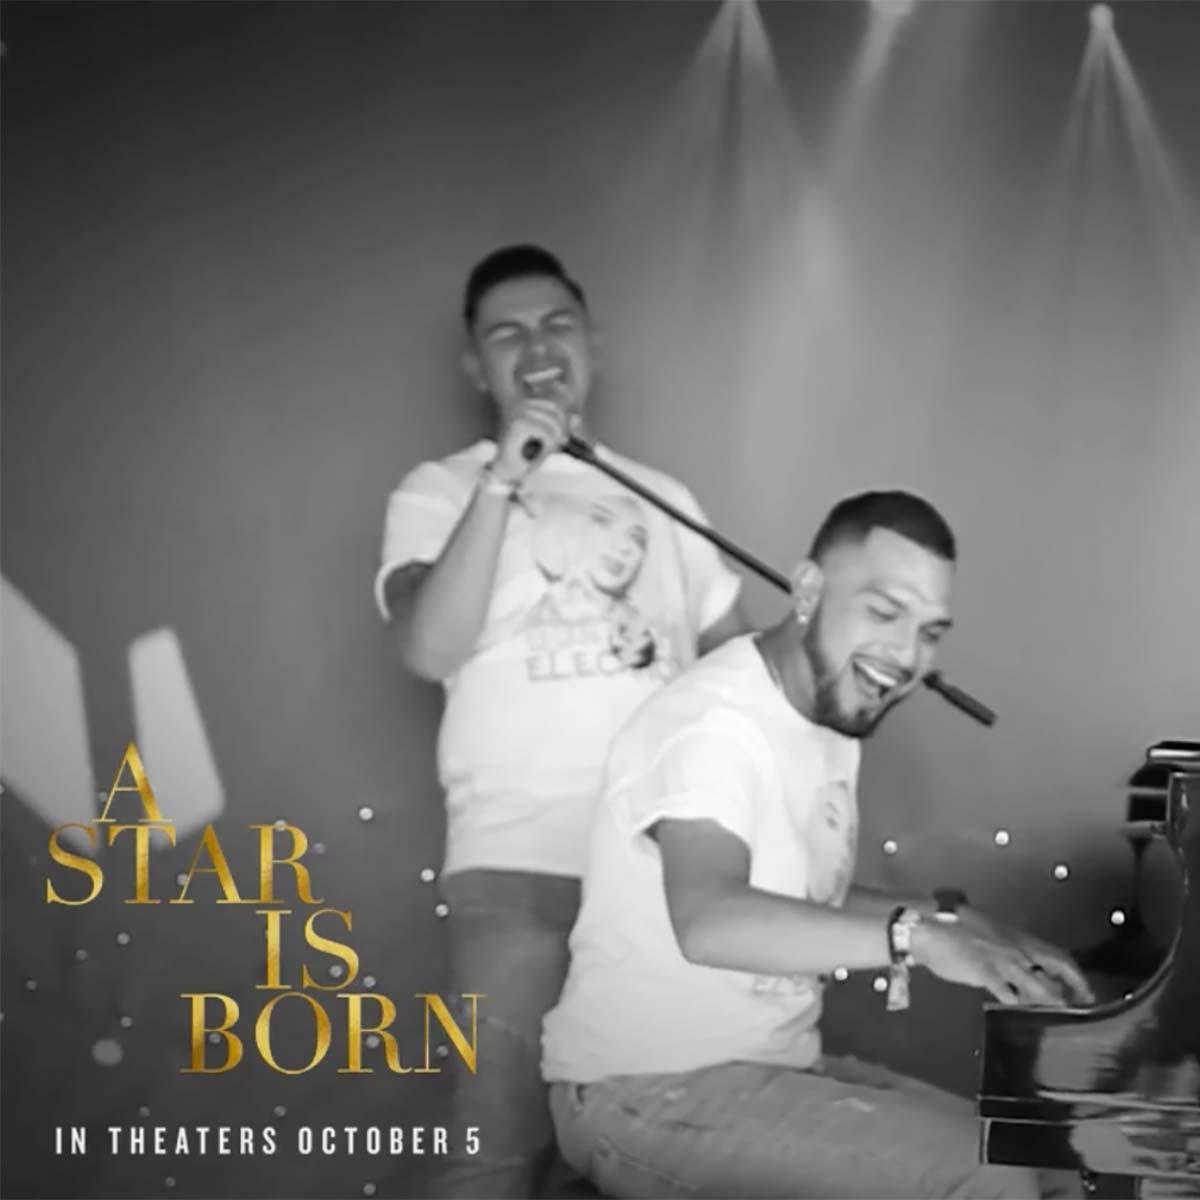 star is born heart radio booth